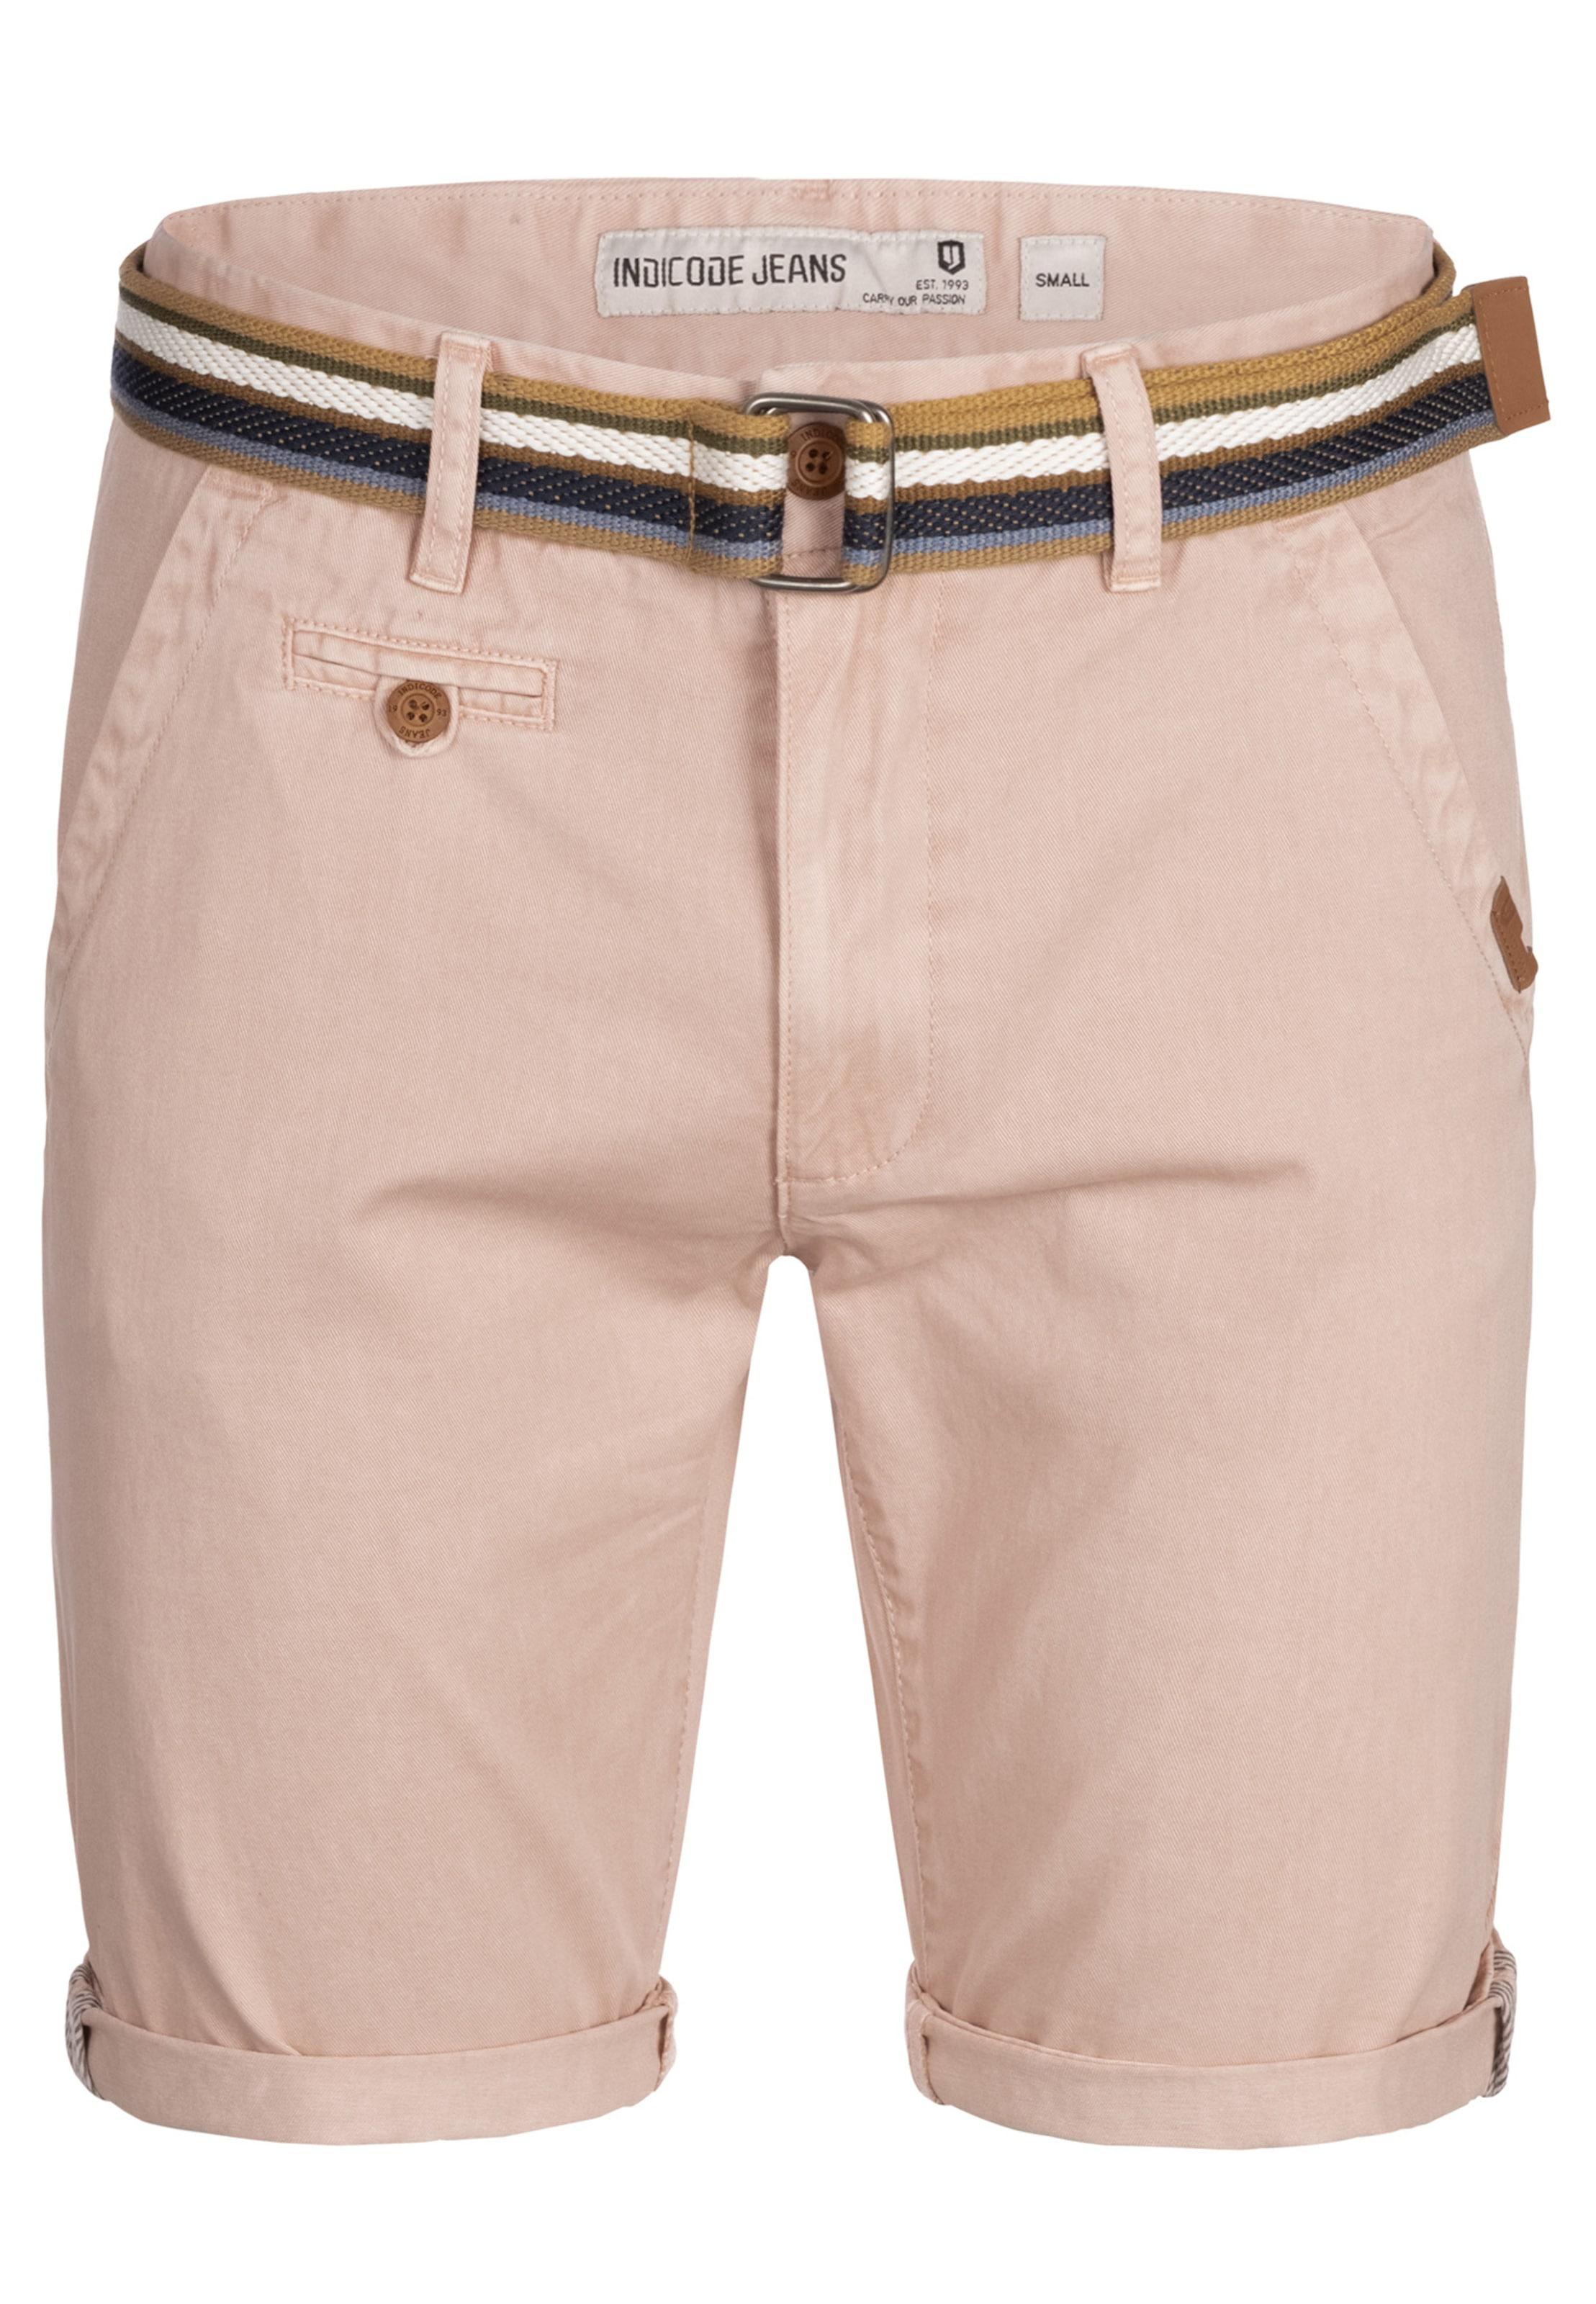 Indicode Altrosa Jeans Shorts 'cuba' In DIYWEH29